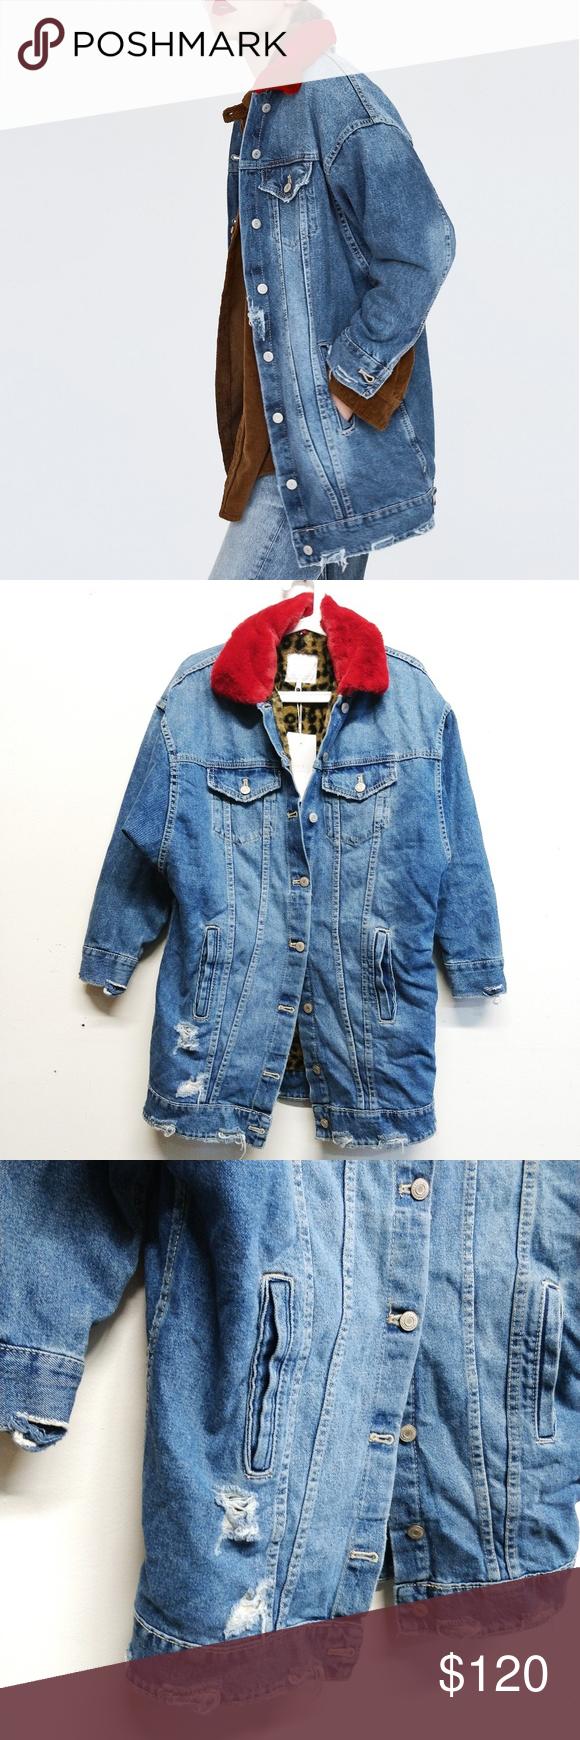 Nwt Zara Long Denim Jacket With Faux Fur Collar M Long Denim Jacket Denim Jacket Faux Fur Collar [ 1740 x 580 Pixel ]